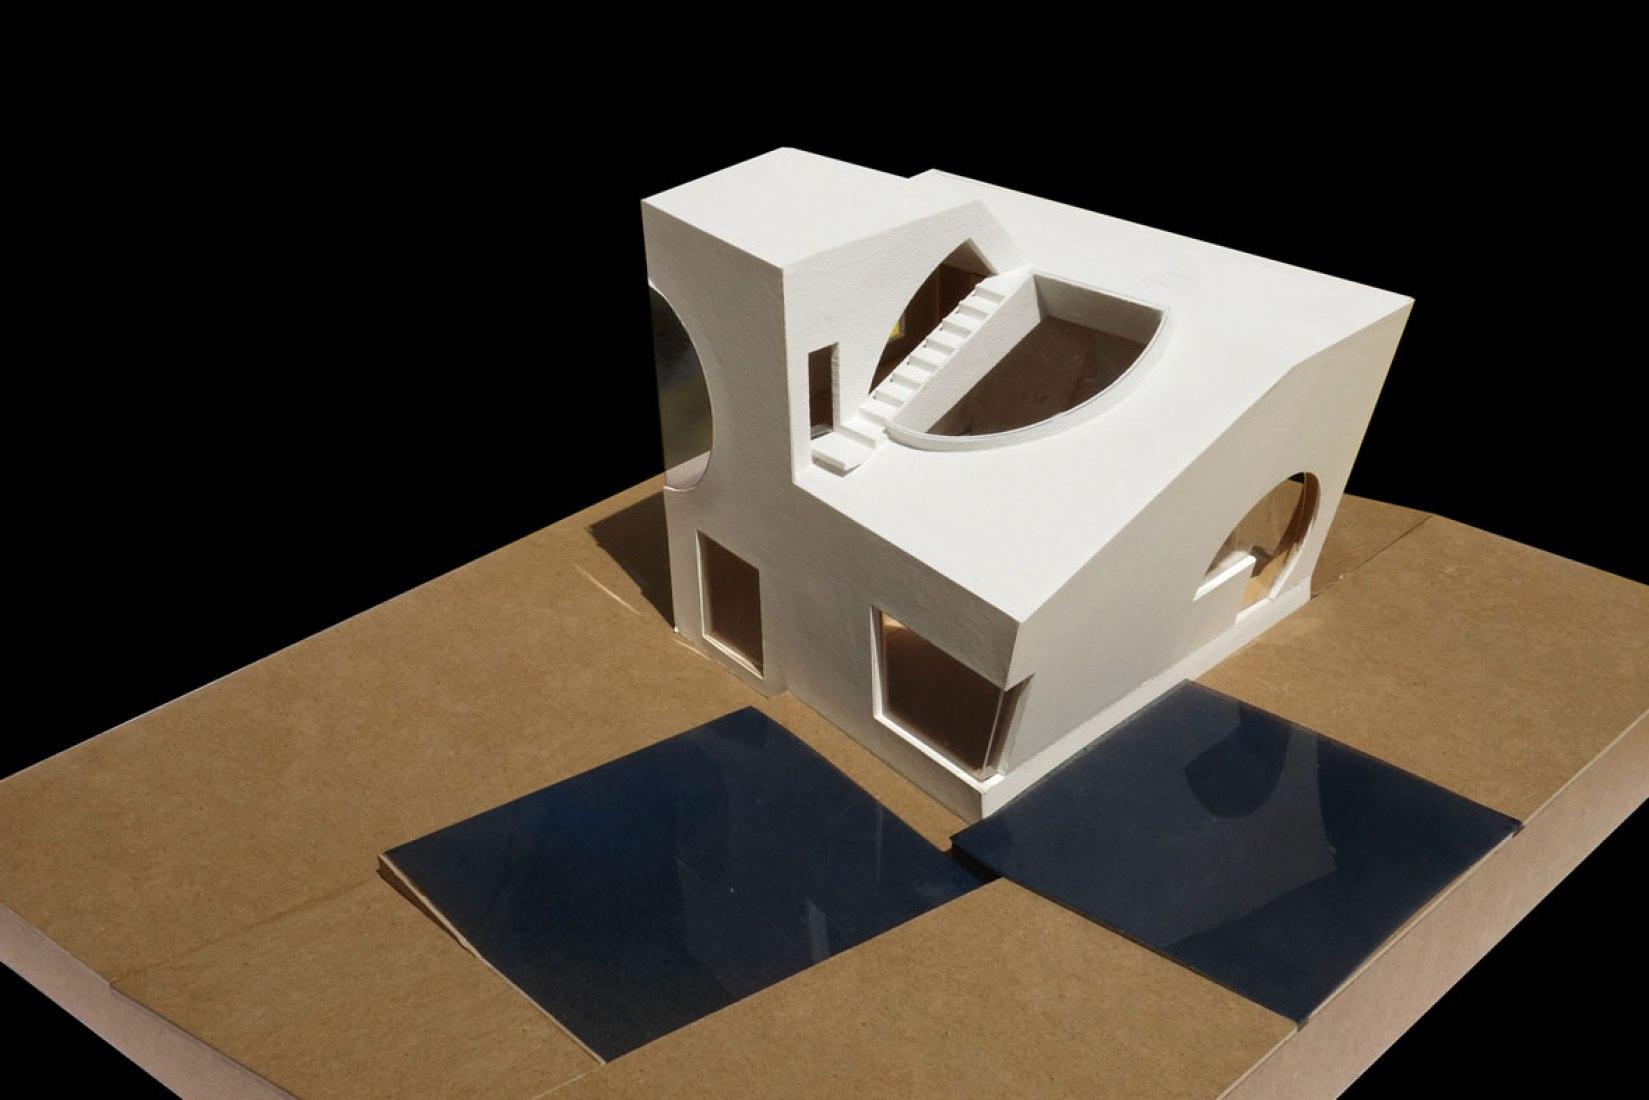 Maqueta. Casa Ex of In por Steven Holl Architects. Imagen cortesía de Steven Holl Architects.